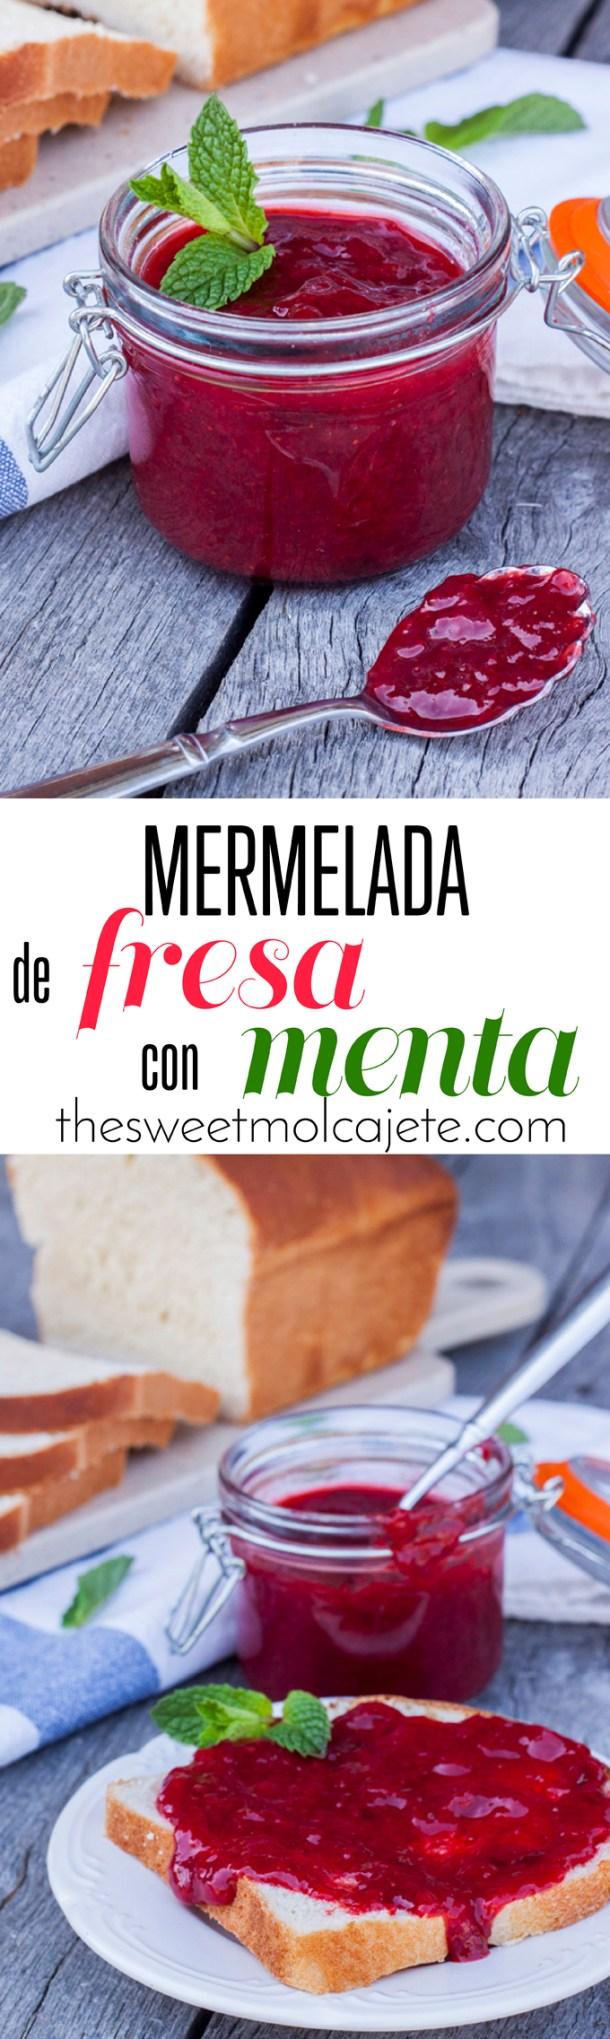 MERMELADA DE FRESA CON MENTA - the sweet molcajete